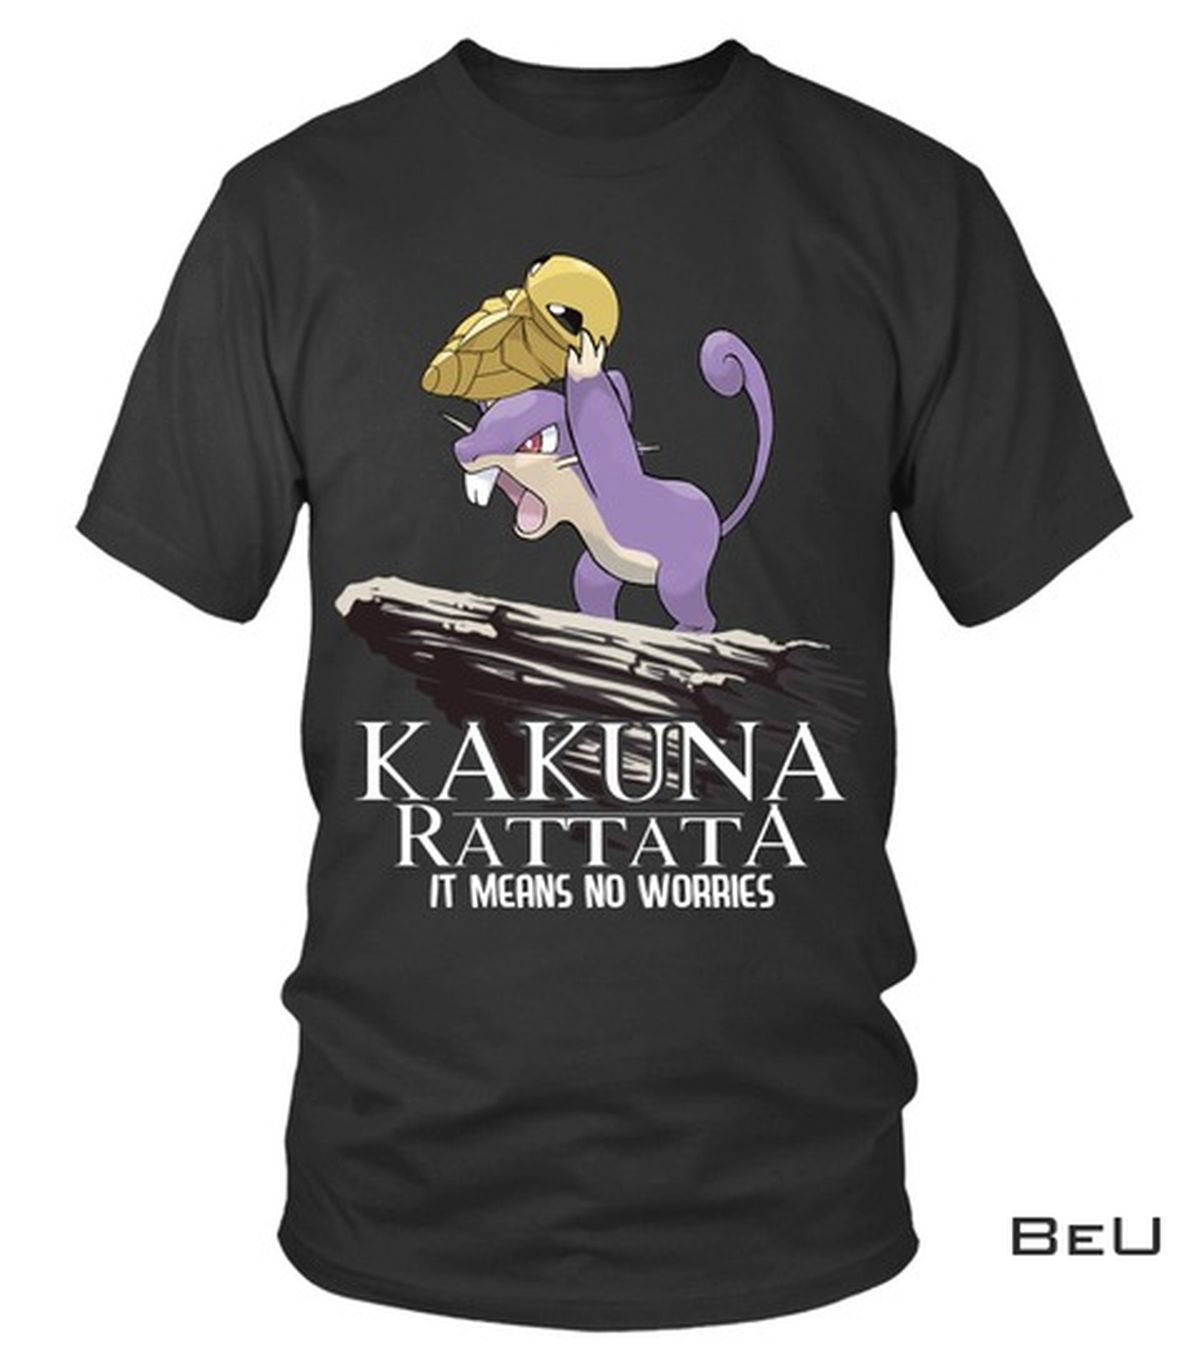 Only For Fan Pokemon Kakuna Rattata It Means No Worries Shirt, hoodie, tank top